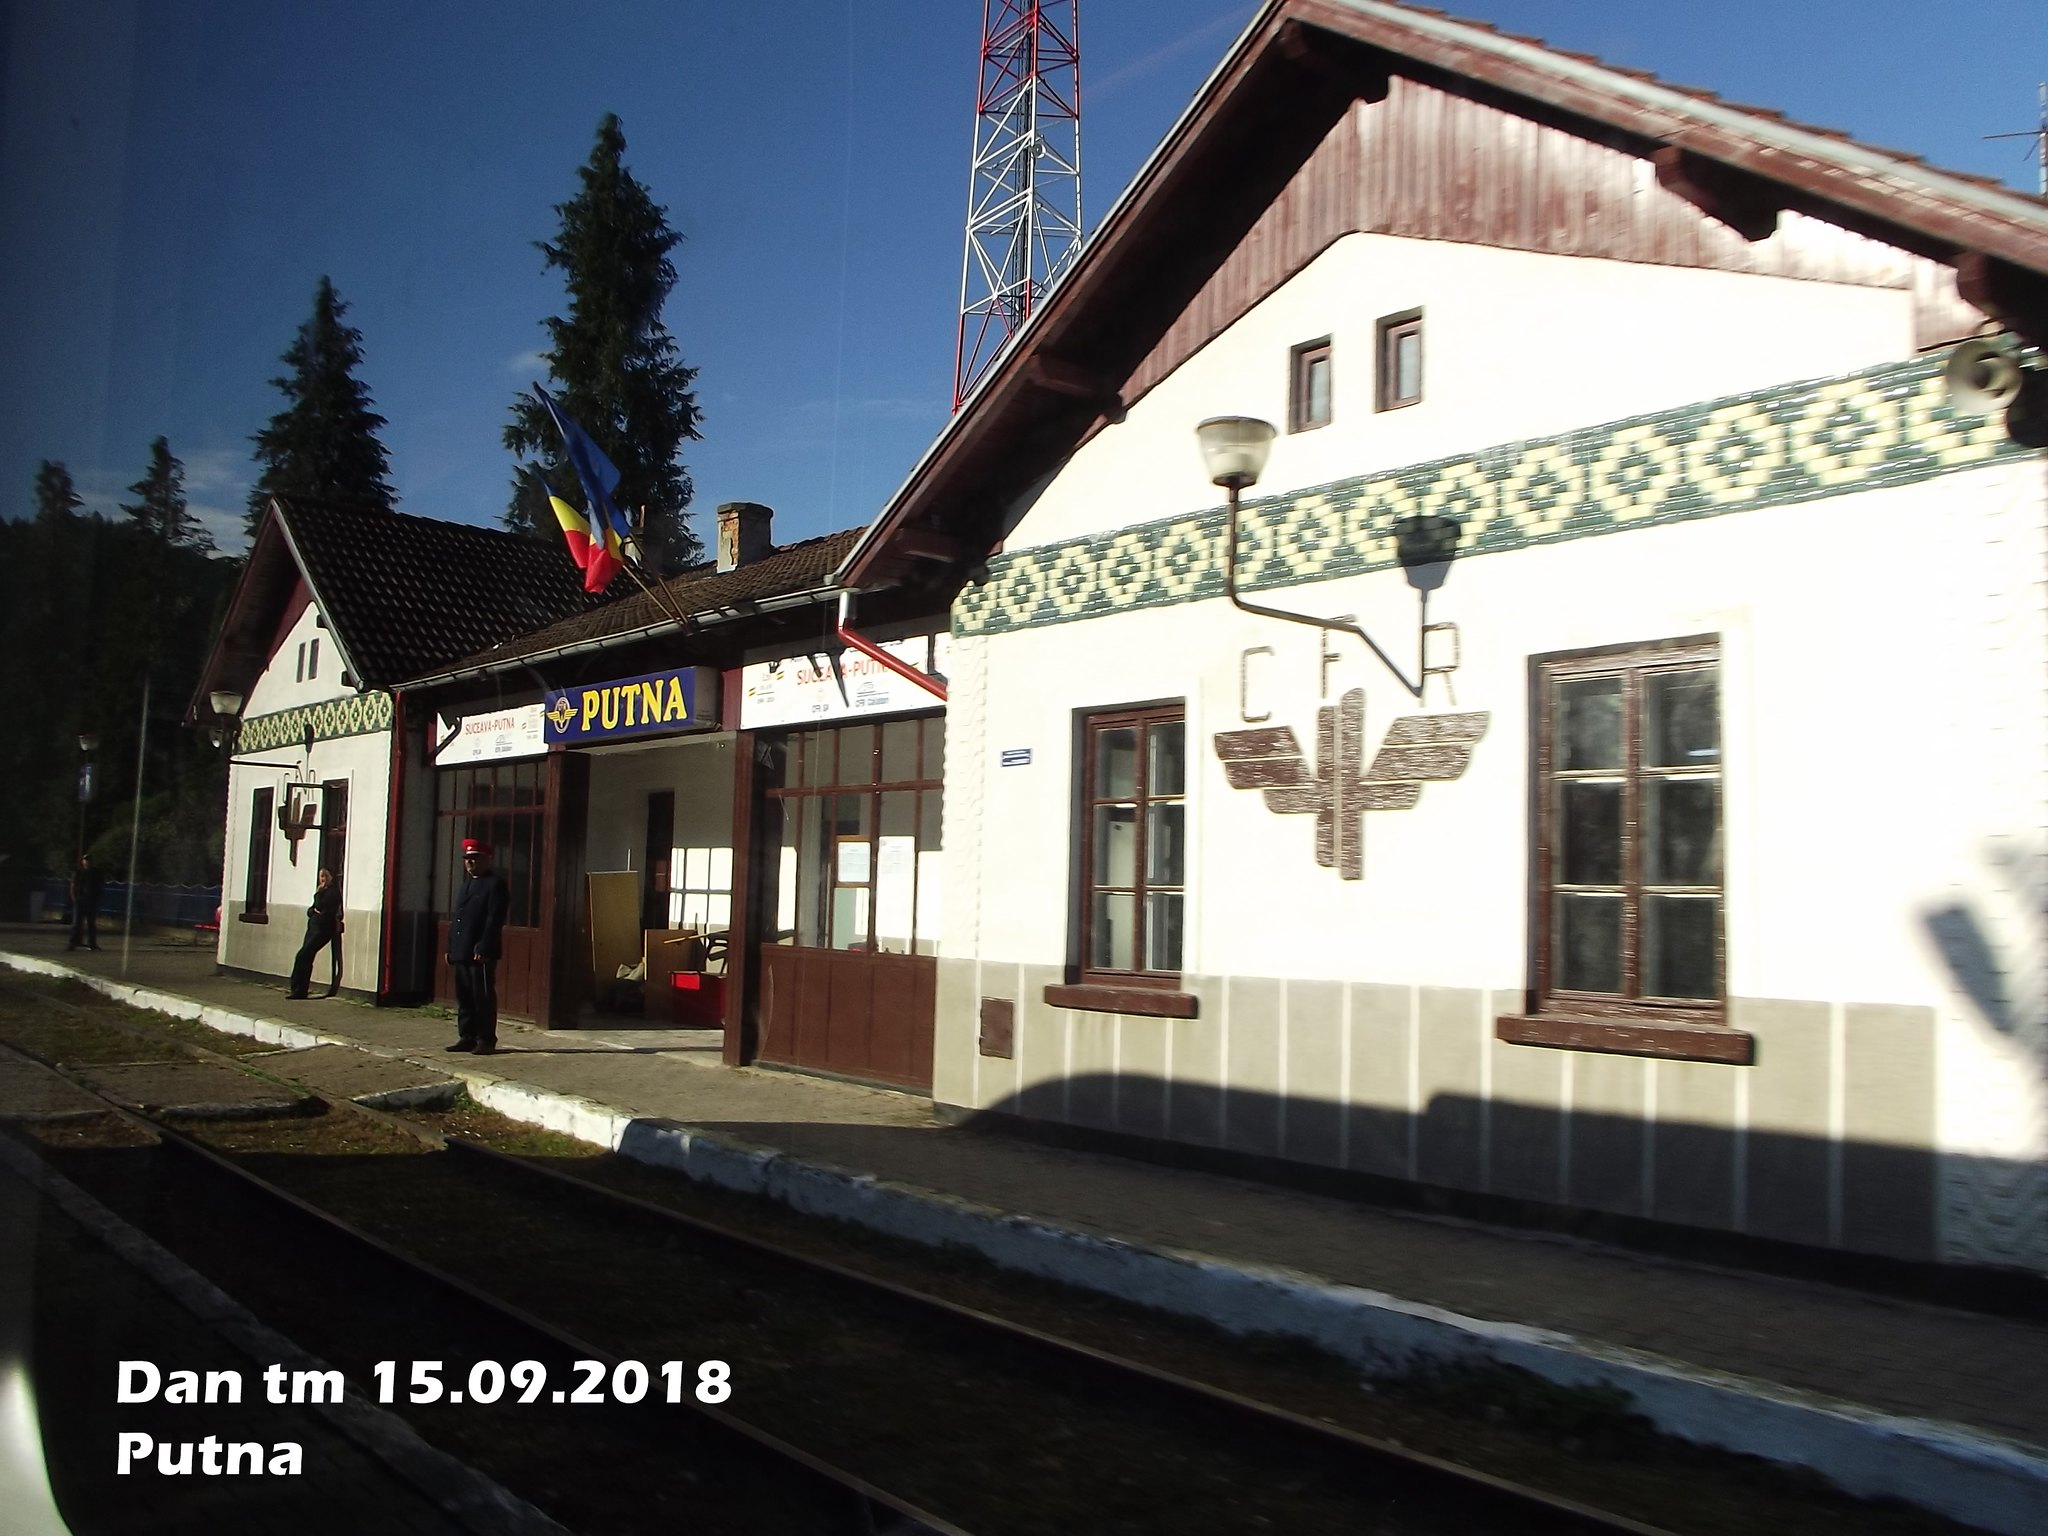 515 : Dorneşti - Gura Putnei - (Putna) - Nisipitu - Seletin UKR - Pagina 47 43826159235_f3a3899d13_k